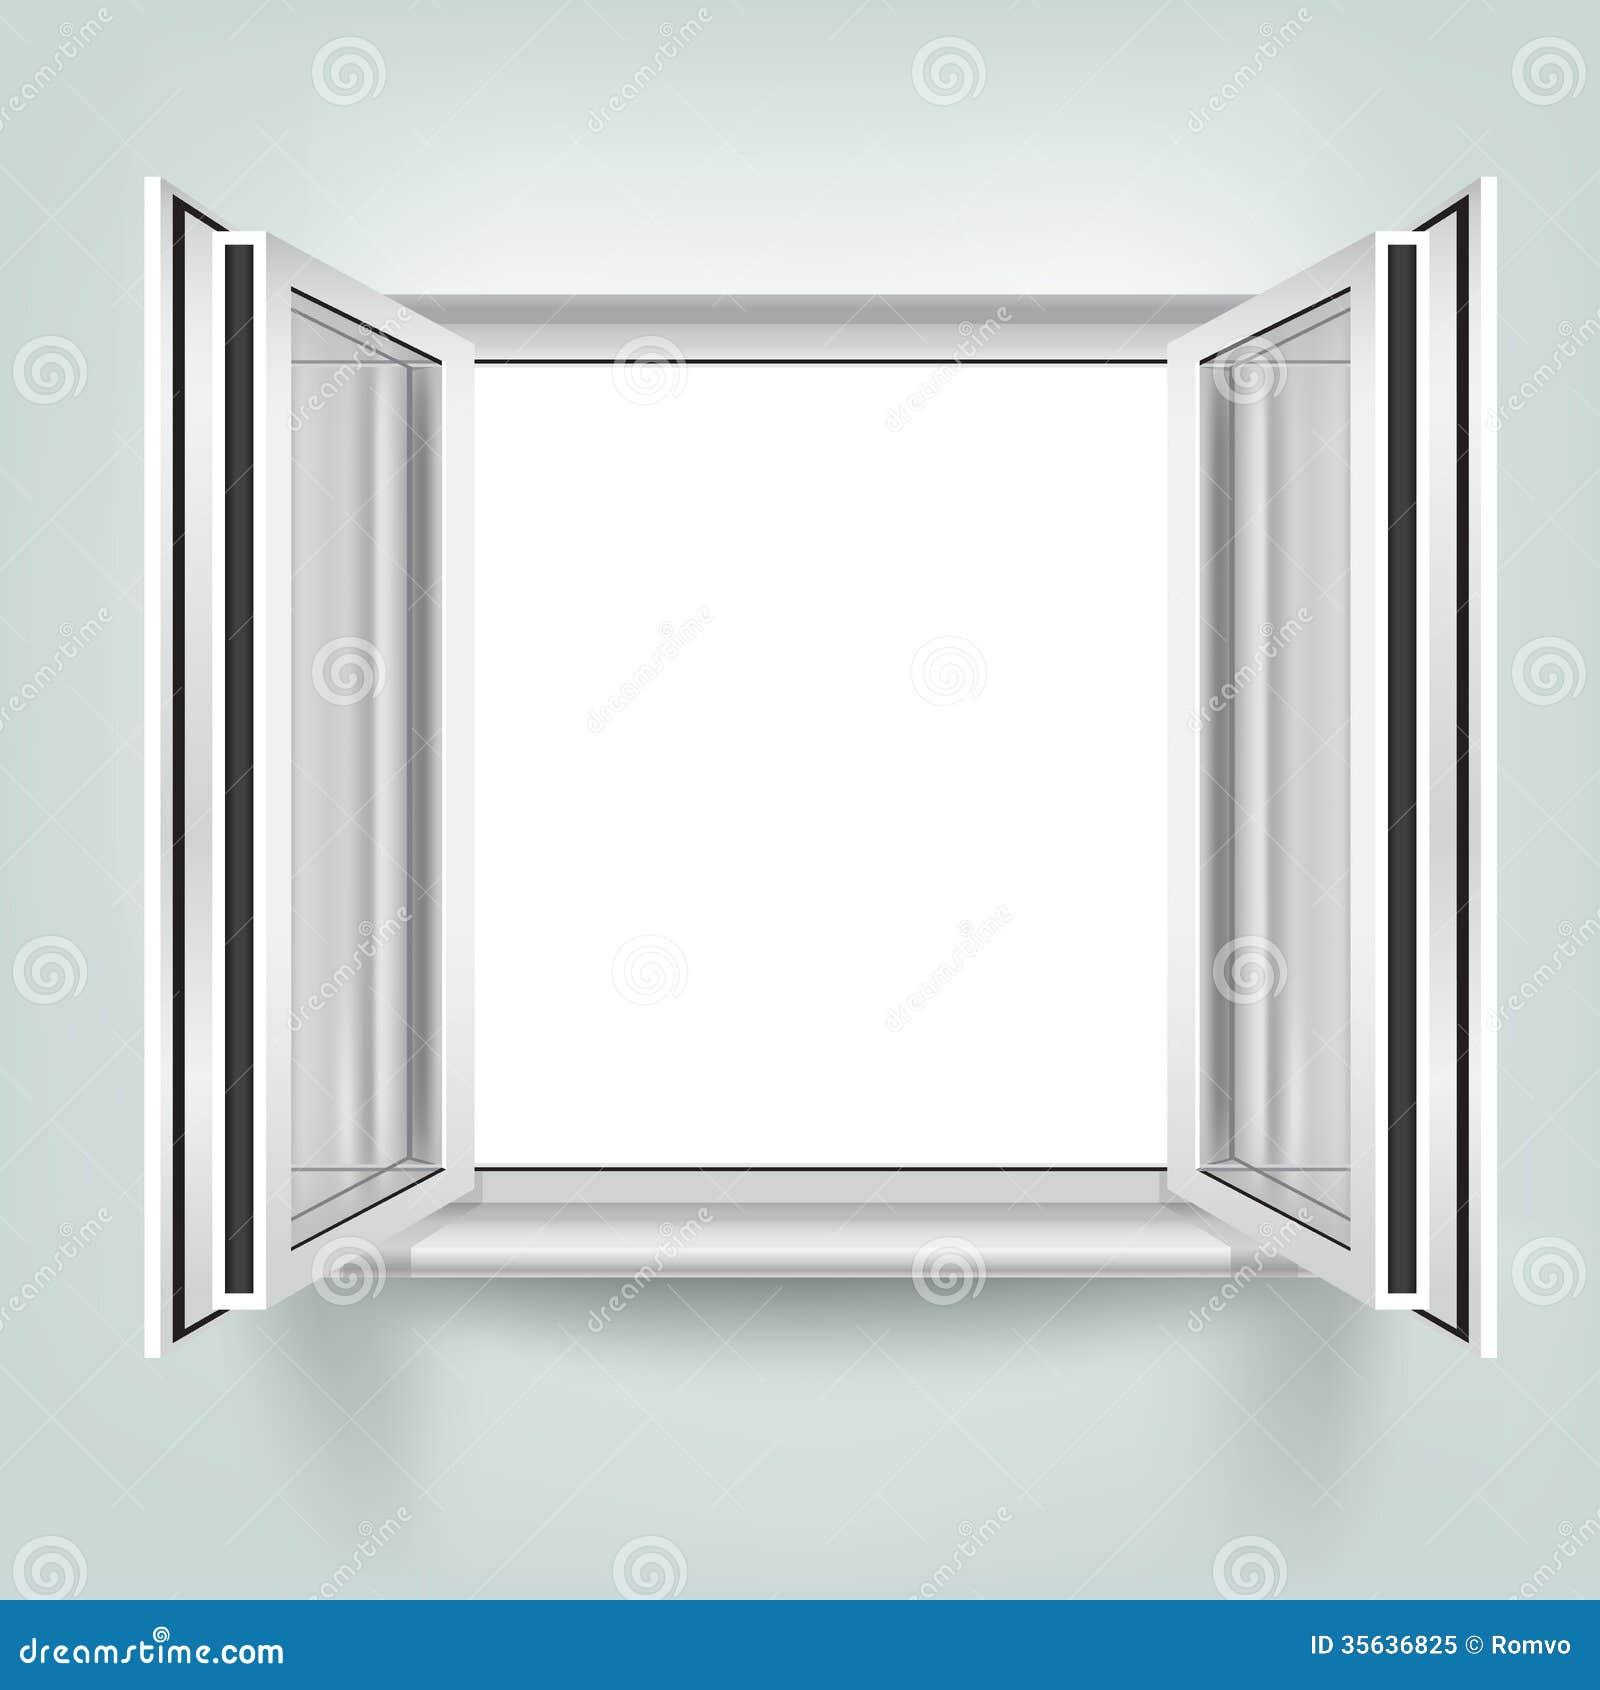 Open window matisse - Open Window Open Window